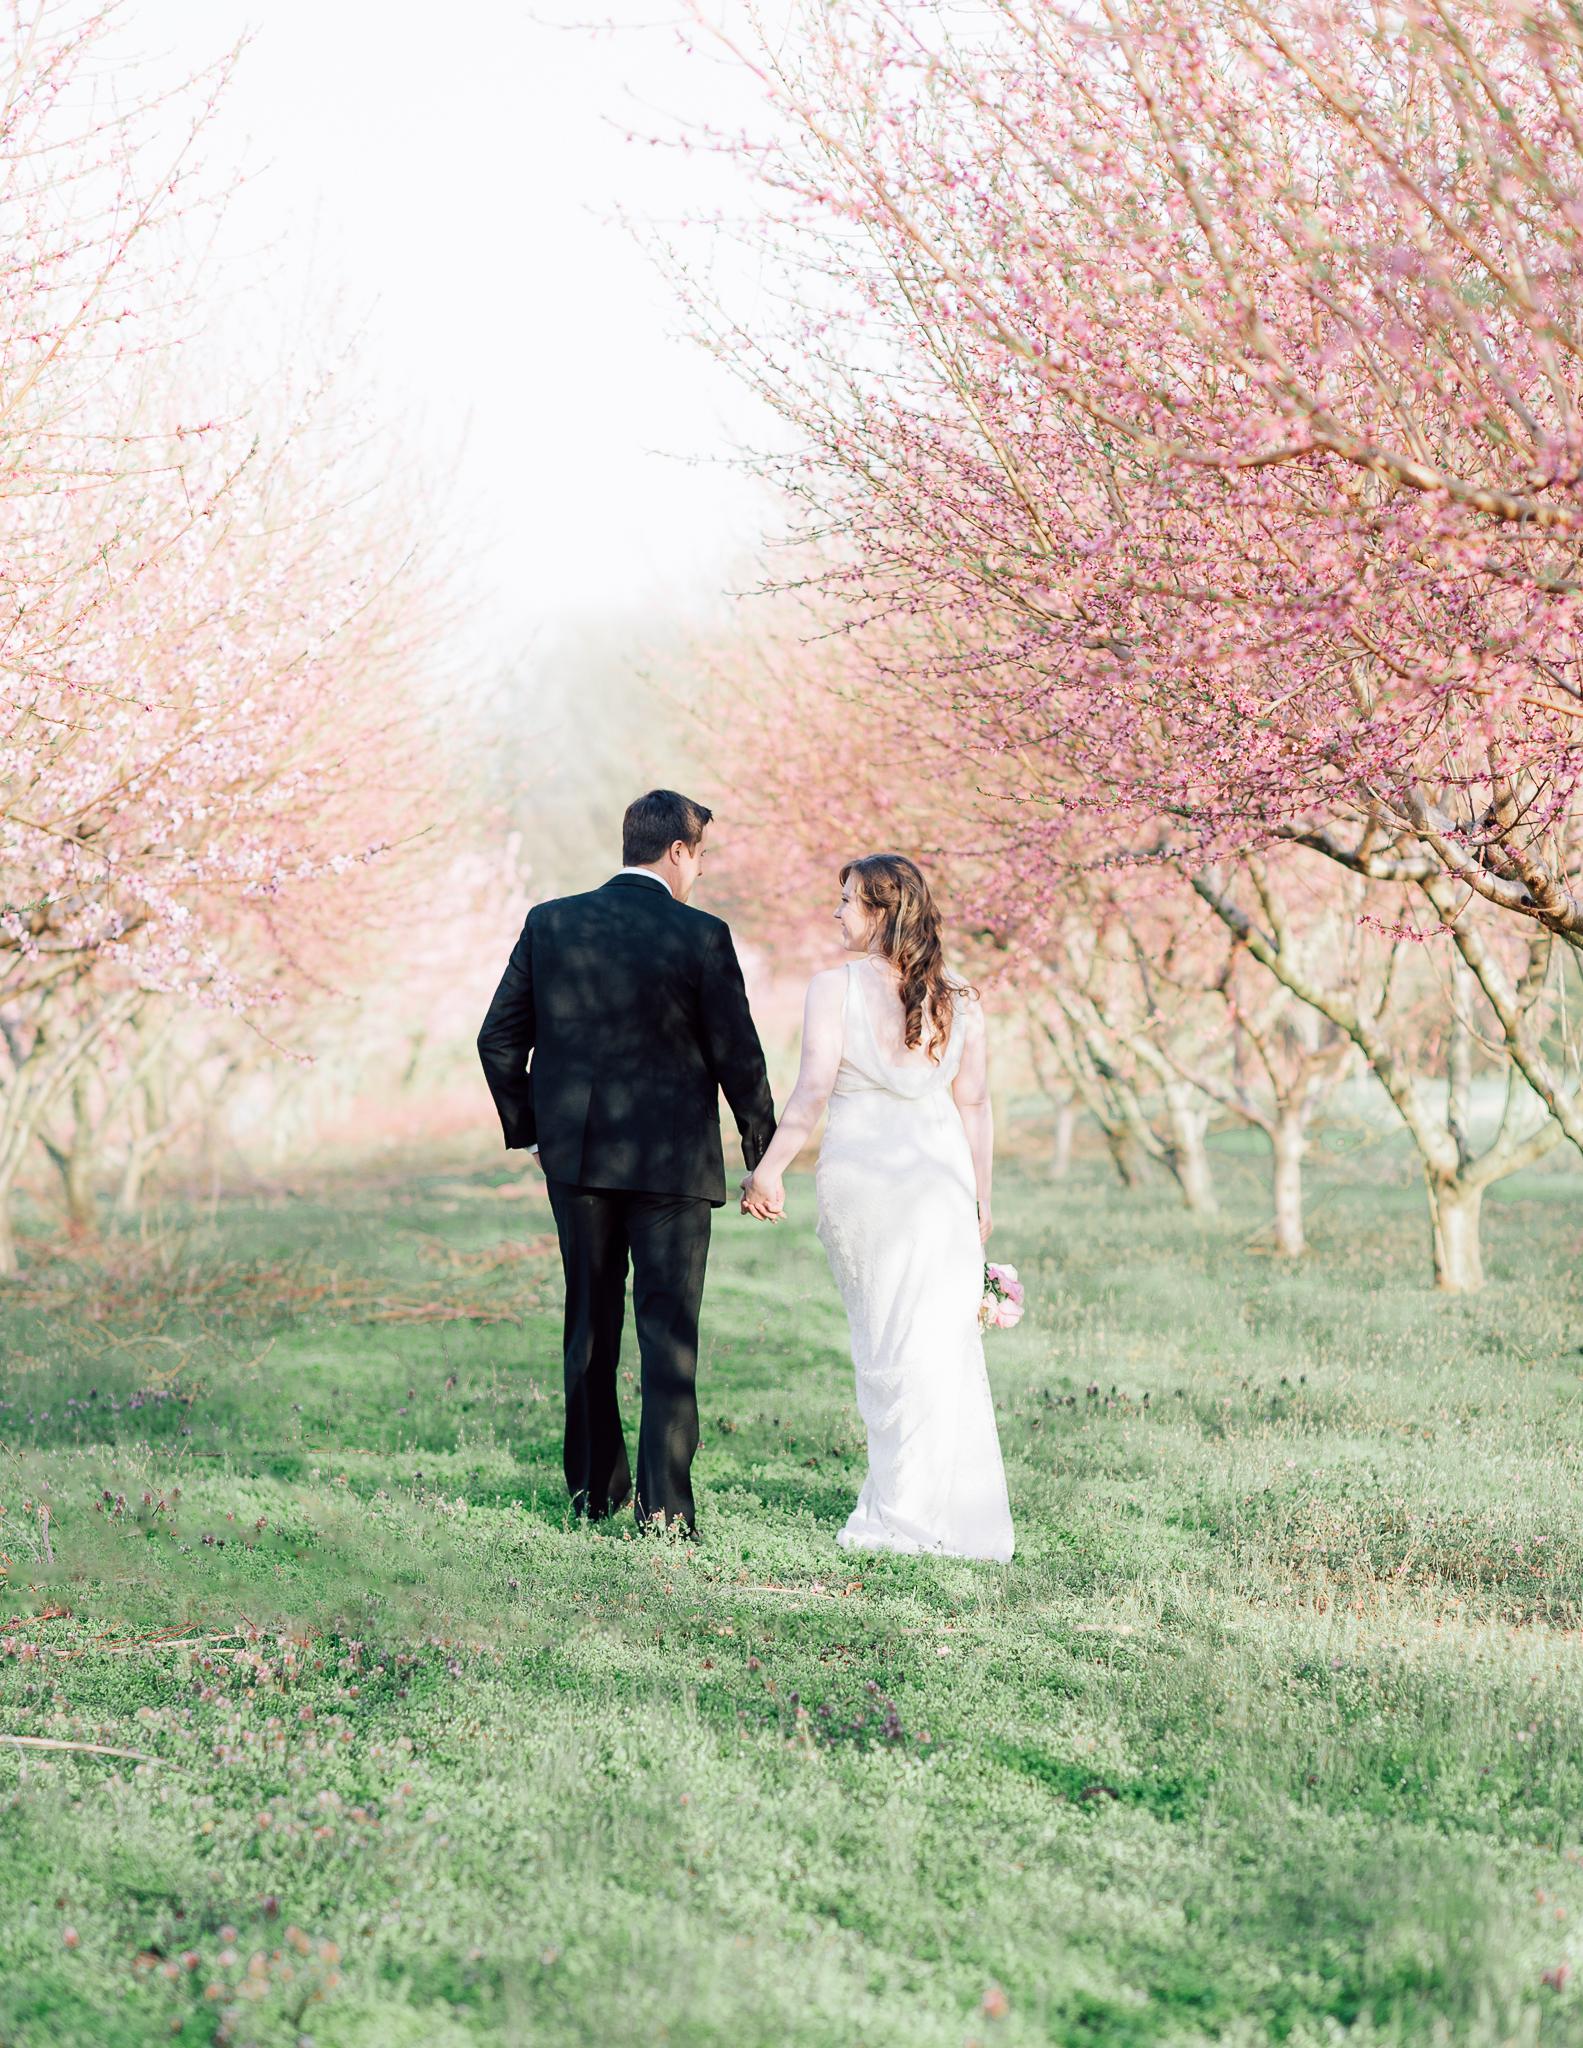 springwedding_cherryblossoms_virginiaphotographer_youseephotography_styledshoot (575).jpg